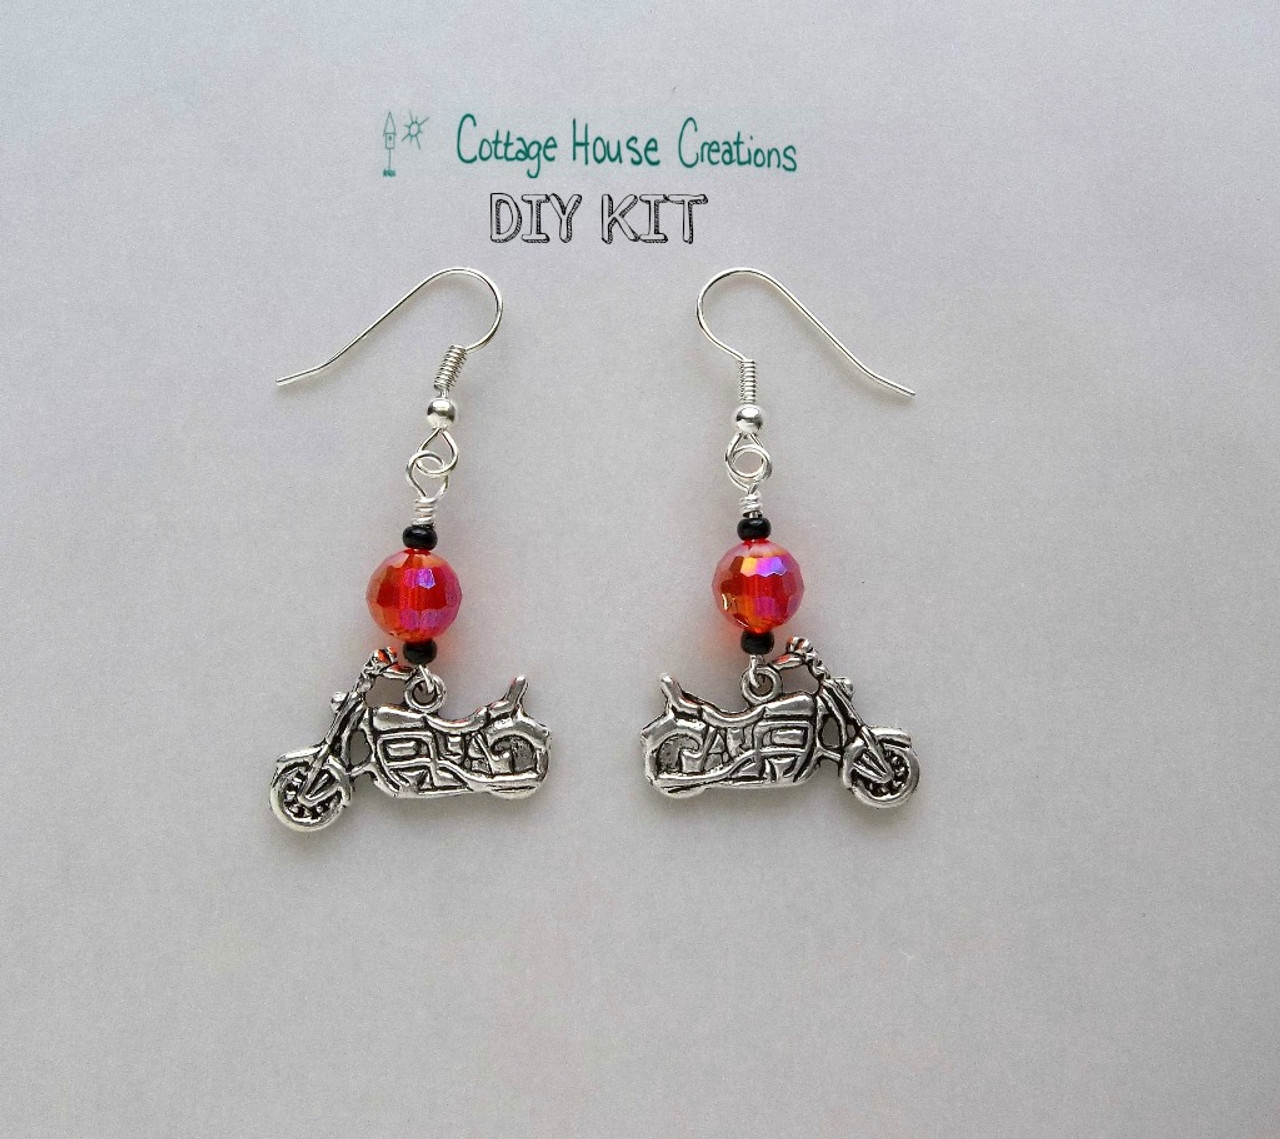 8034dead35d57 Motorcycle Biker Chic Beaded Earring Kit Jewelry Making Supplies DIY